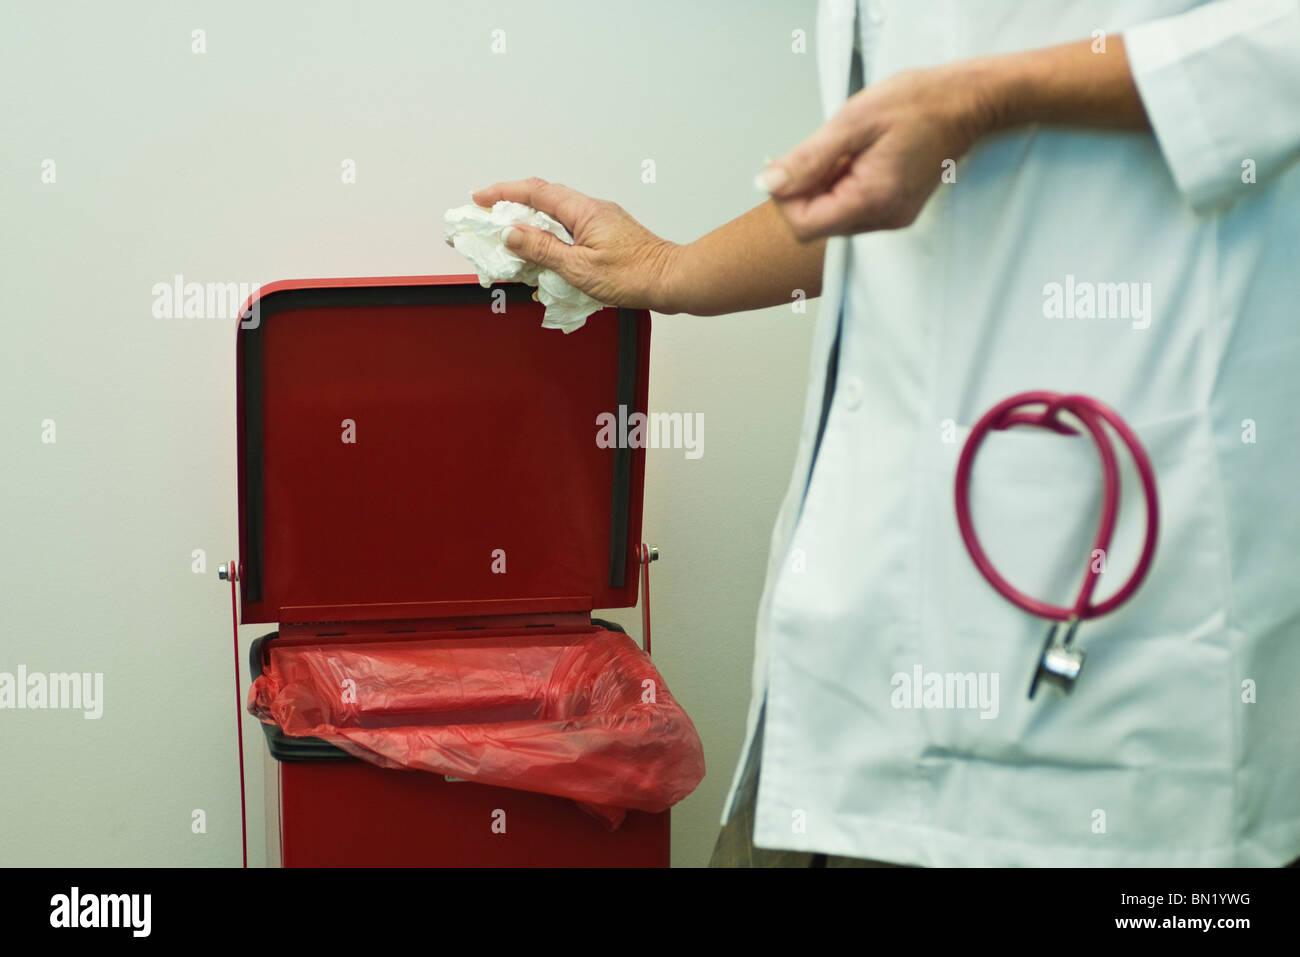 Discarding waste in medical waste bin - Stock Image